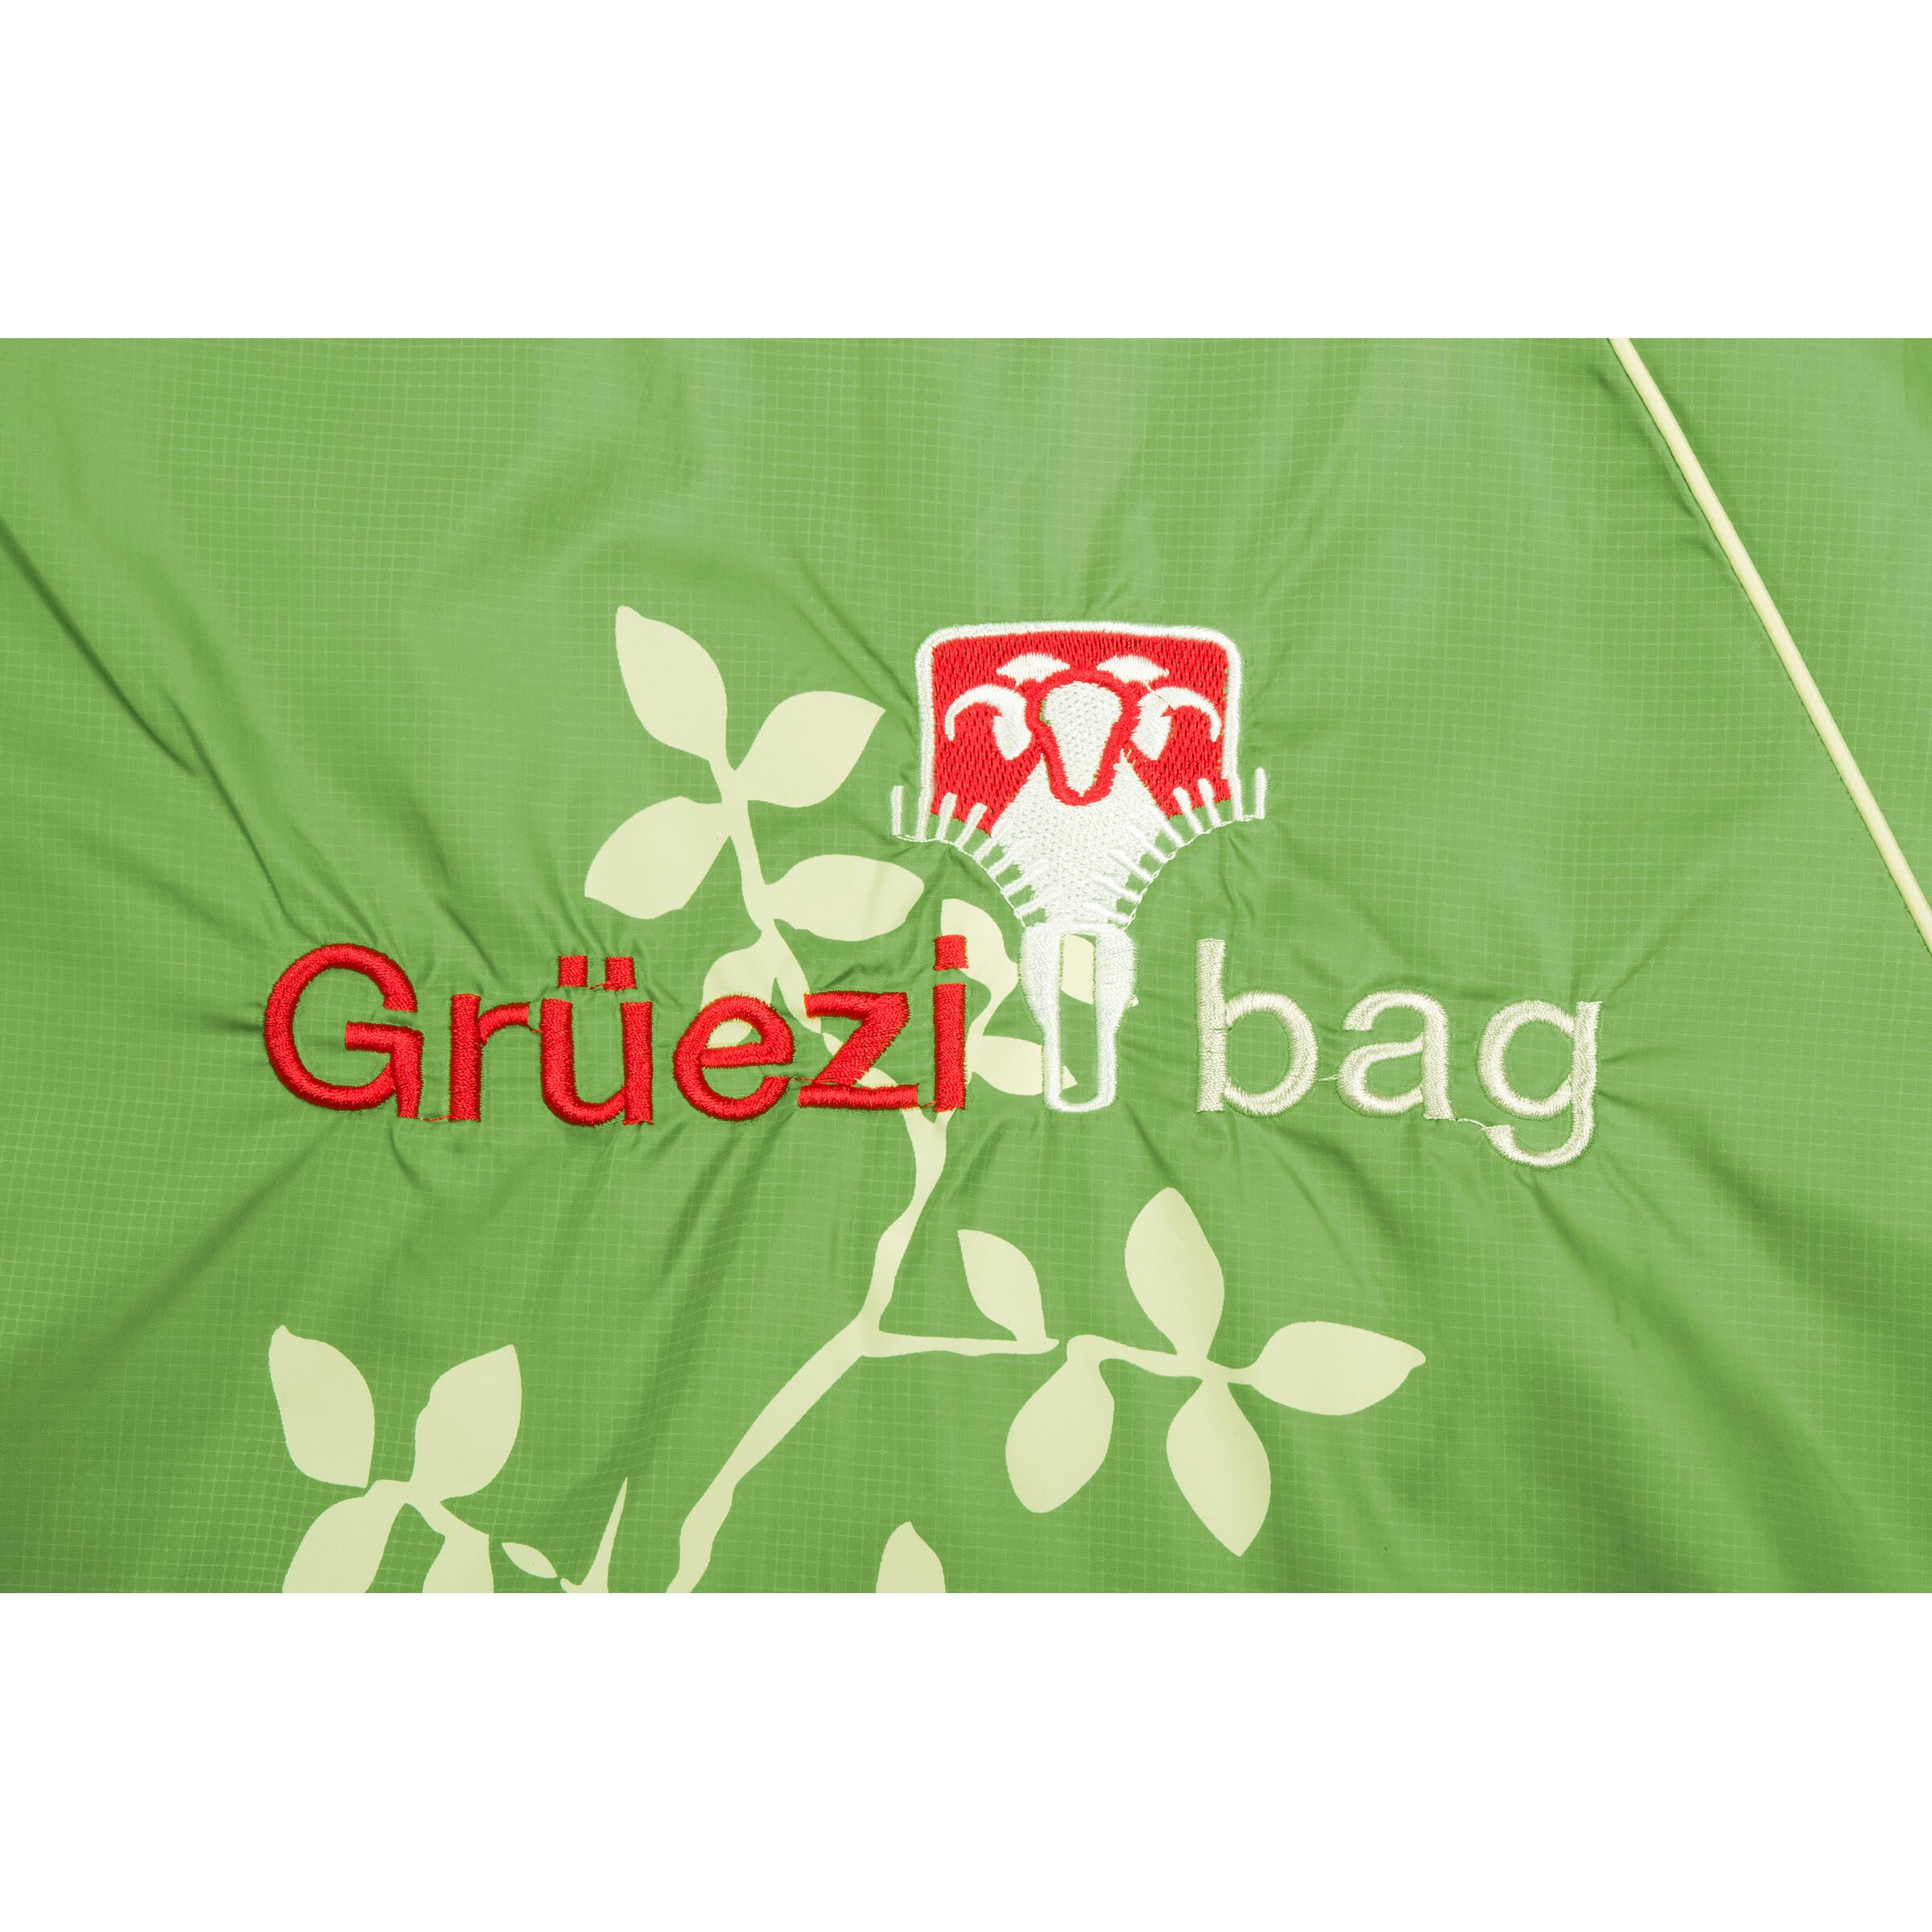 Grüezi-Bag Cloud Decke Reh III Schlafsack - spring green - 225 x 80cm